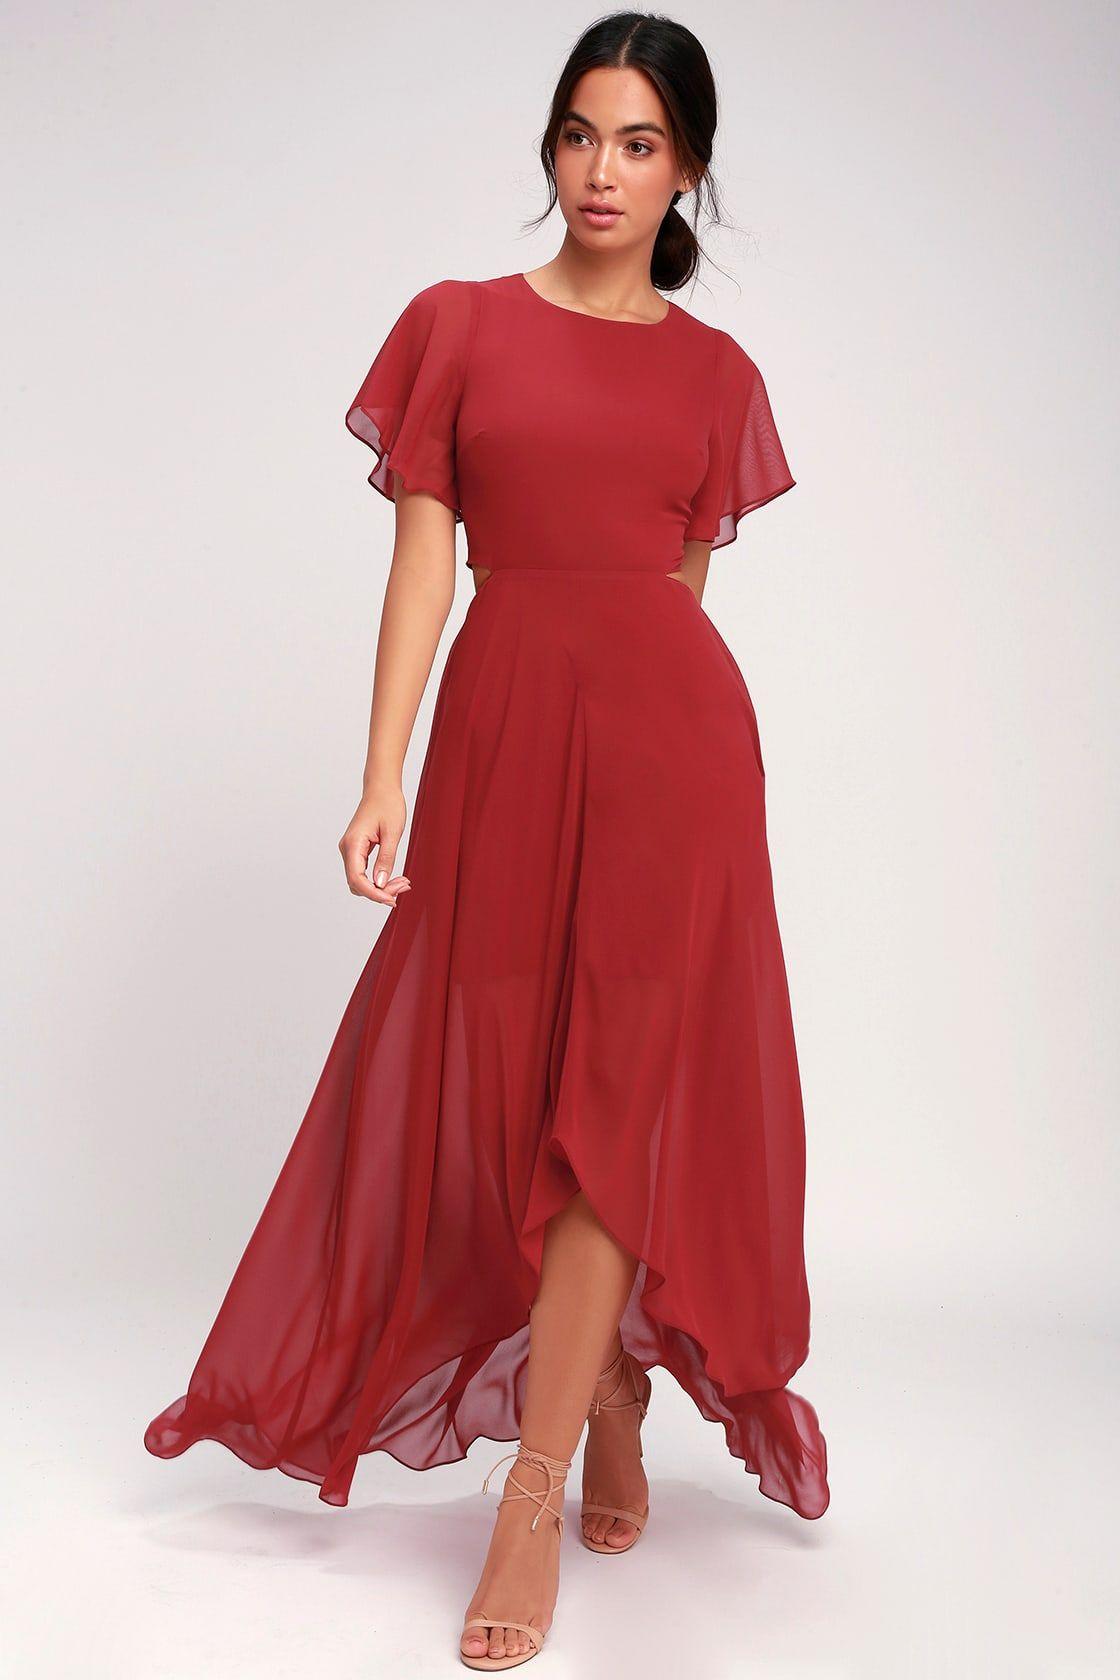 2897f6d370 Bohemian Rhapsody Brick Red Cutout High-Low Dress in 2019   Clothing ...